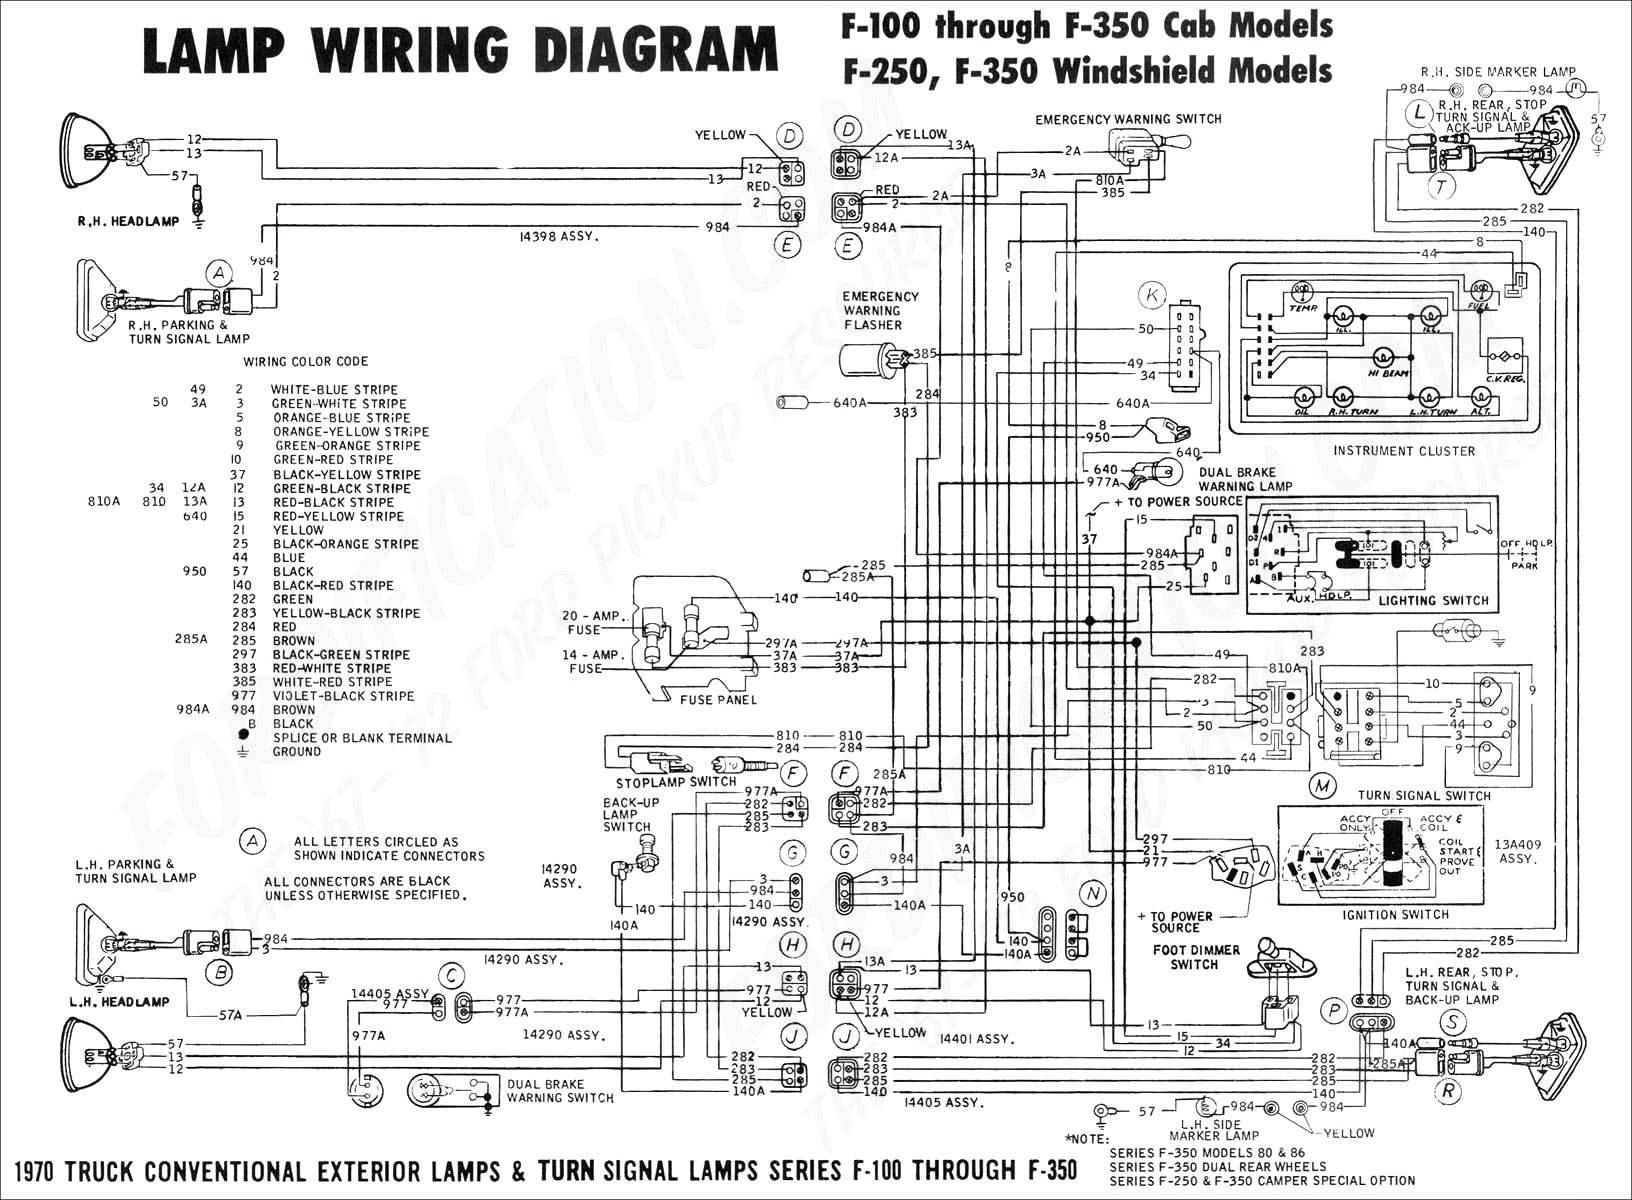 wiring diagram for 1993 miata